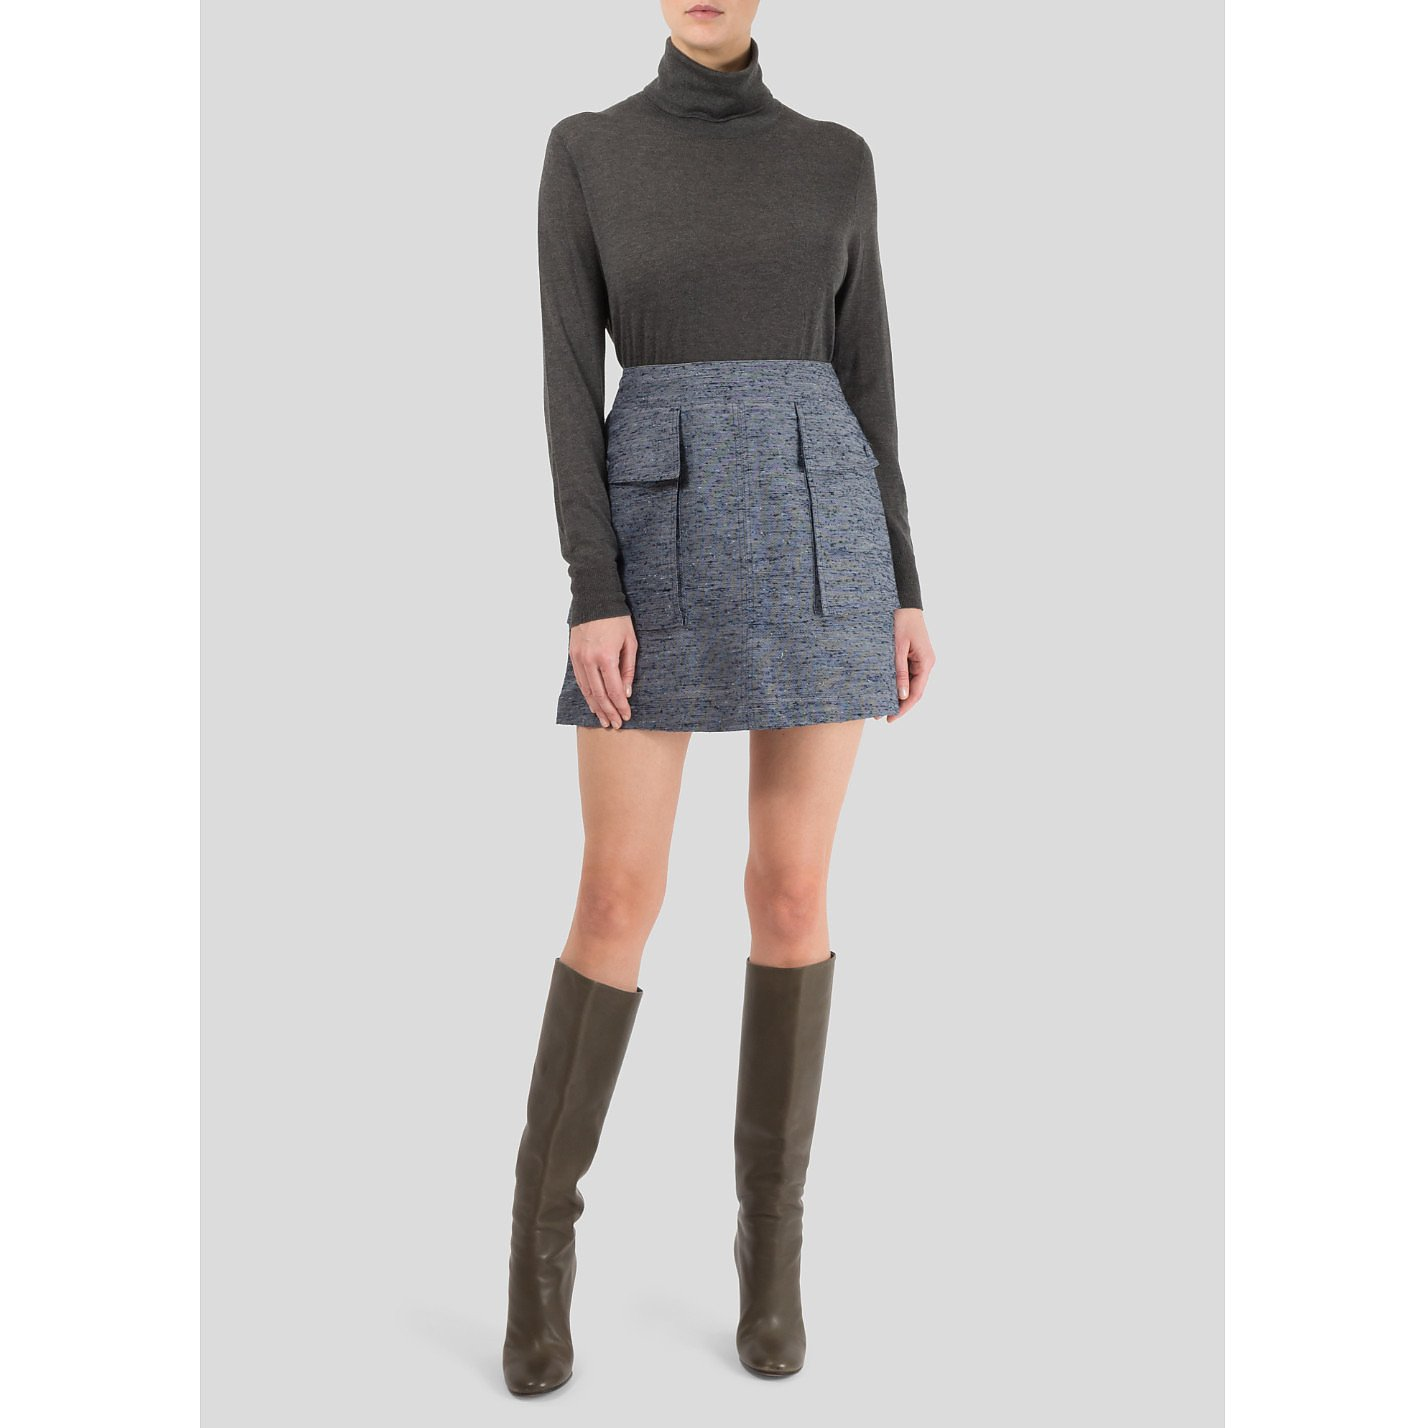 Stella McCartney Textured Mini Skirt